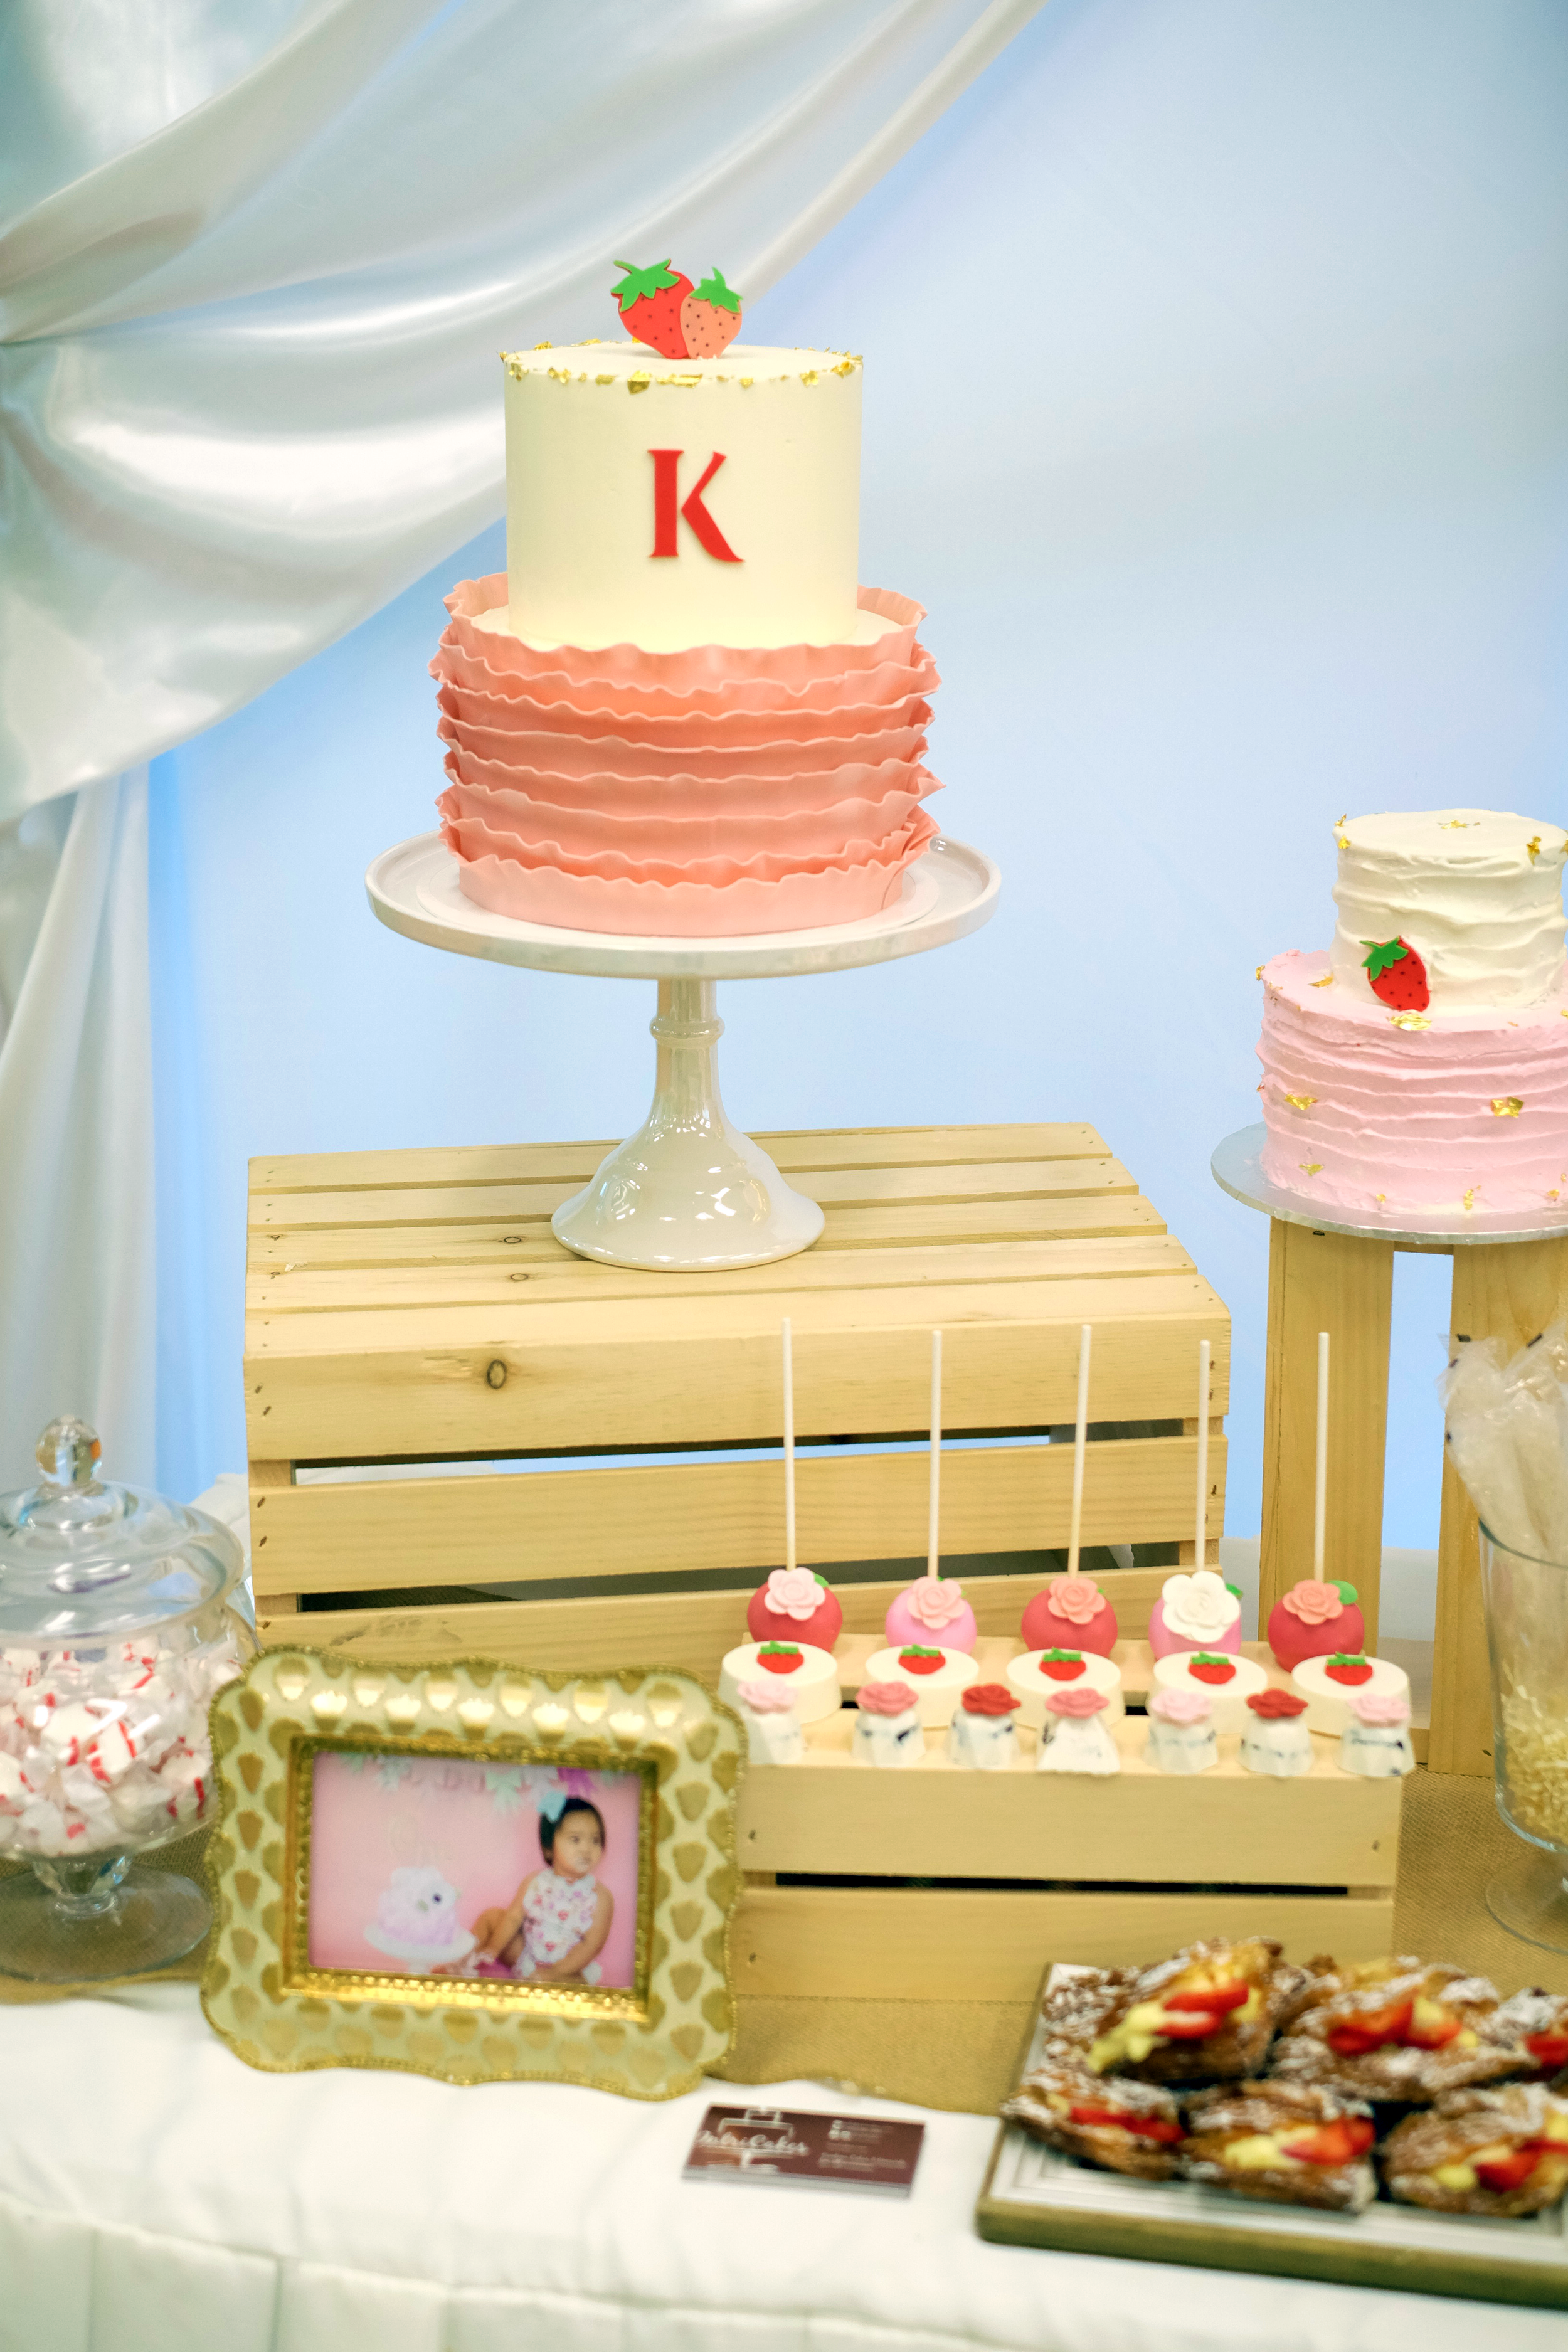 cakeshot.png